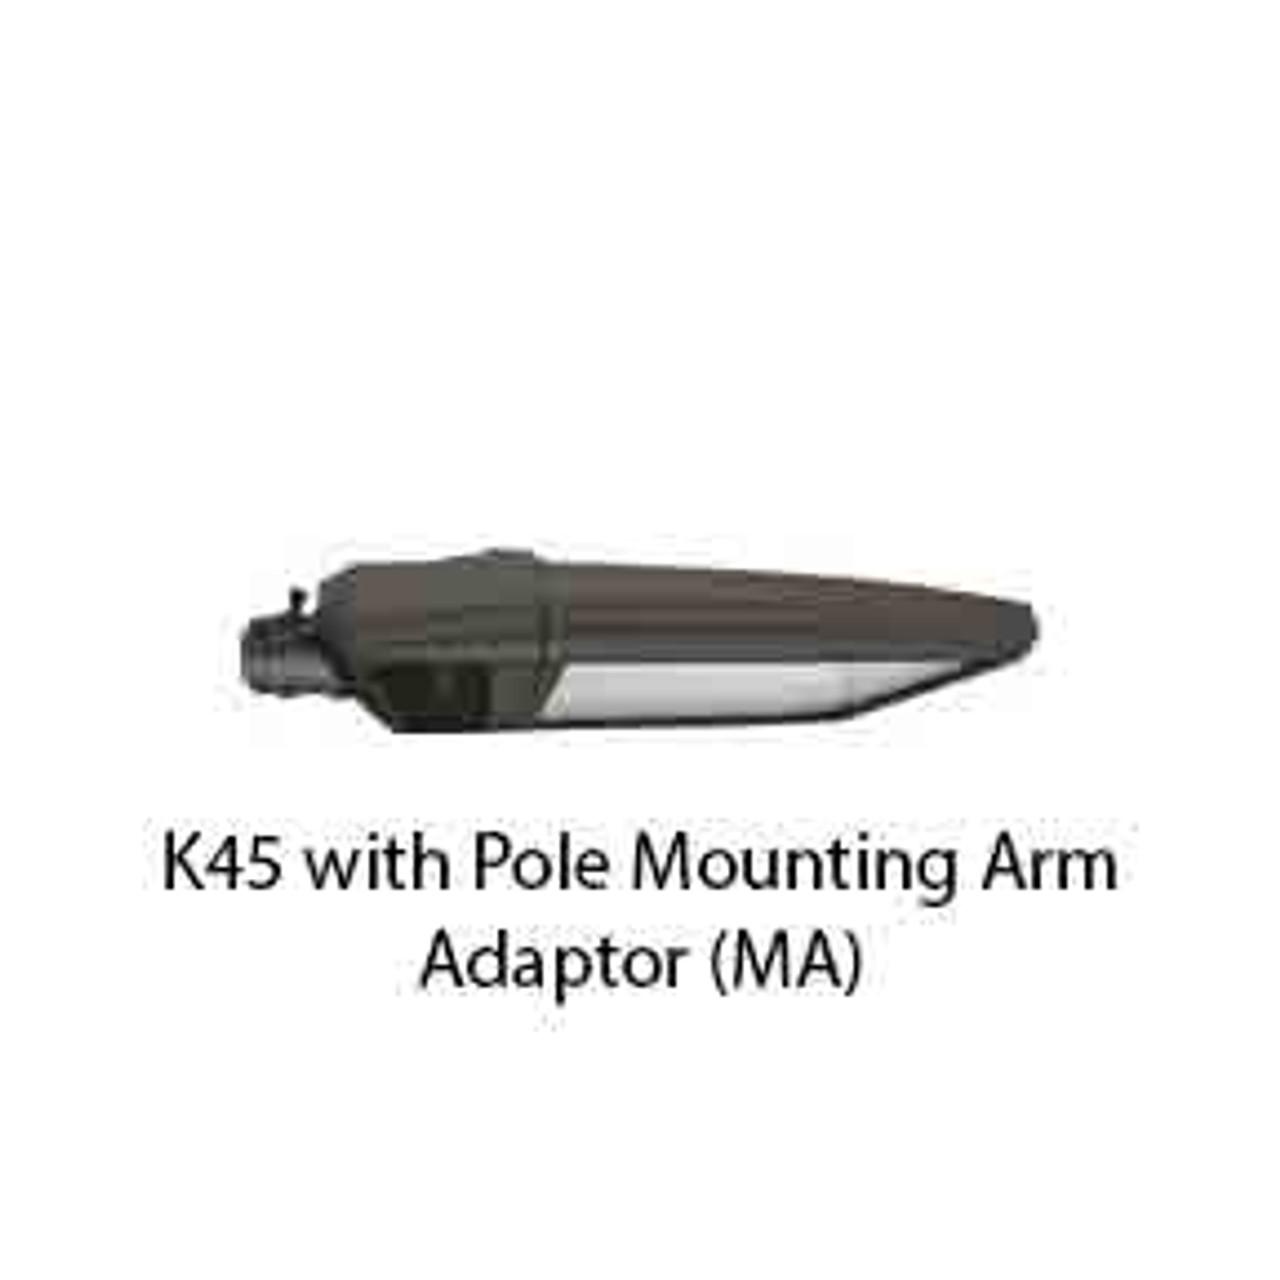 K45 with Pole Mounting Arm Adaptor (MA)